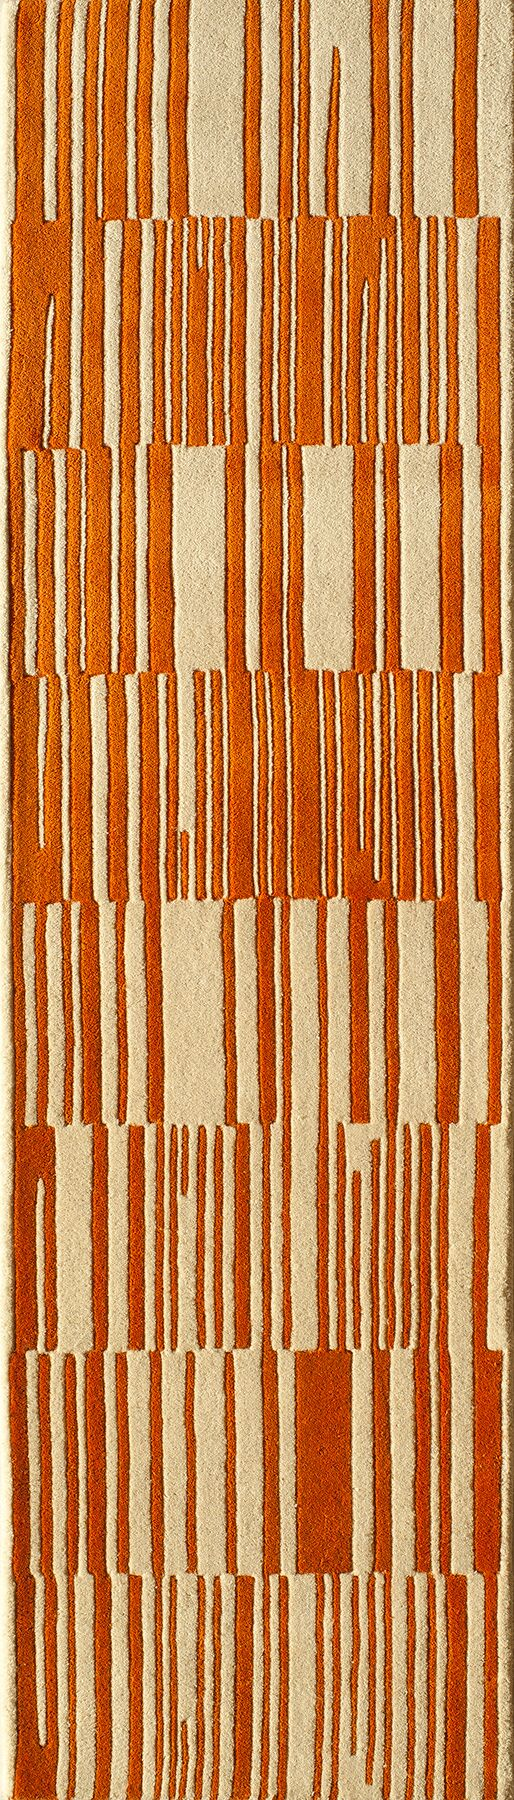 Sawyer Hand-Tufted Orange Area Rug Rug Size: Rectangle 3'6